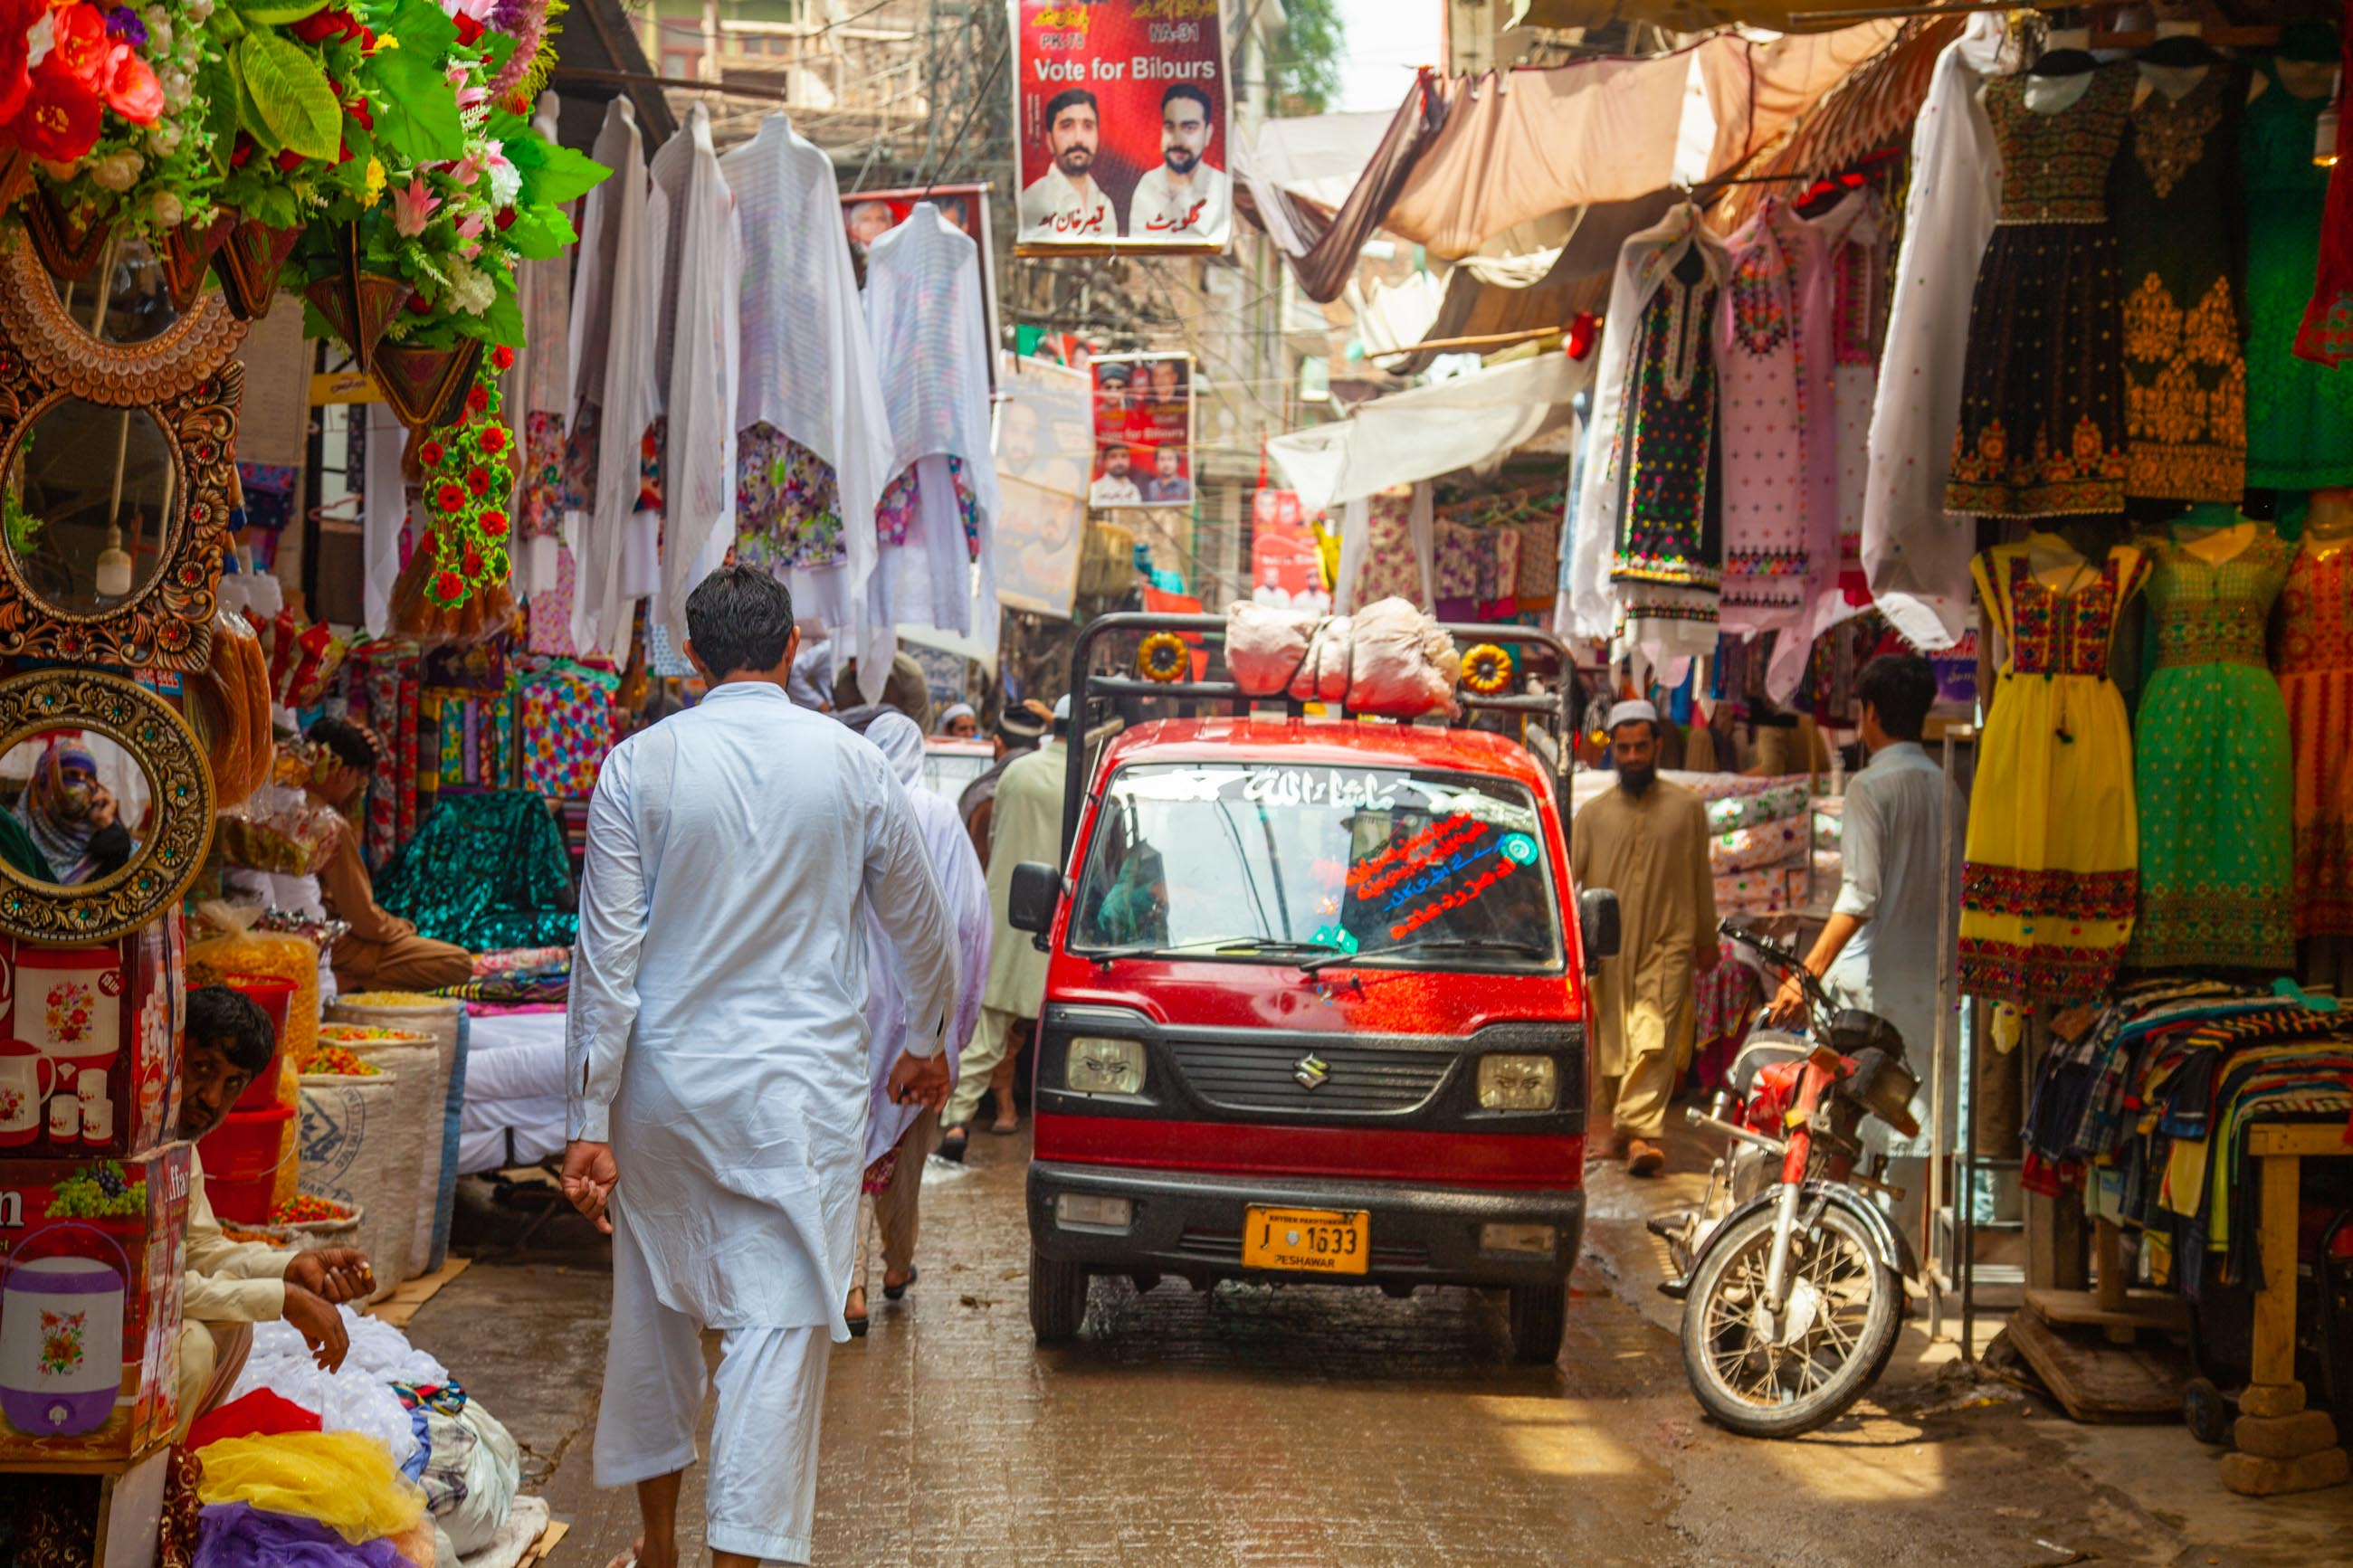 https://bubo.sk/uploads/galleries/4920/samuelklc_pakistan_peshawar_lahore_img_0029.jpg